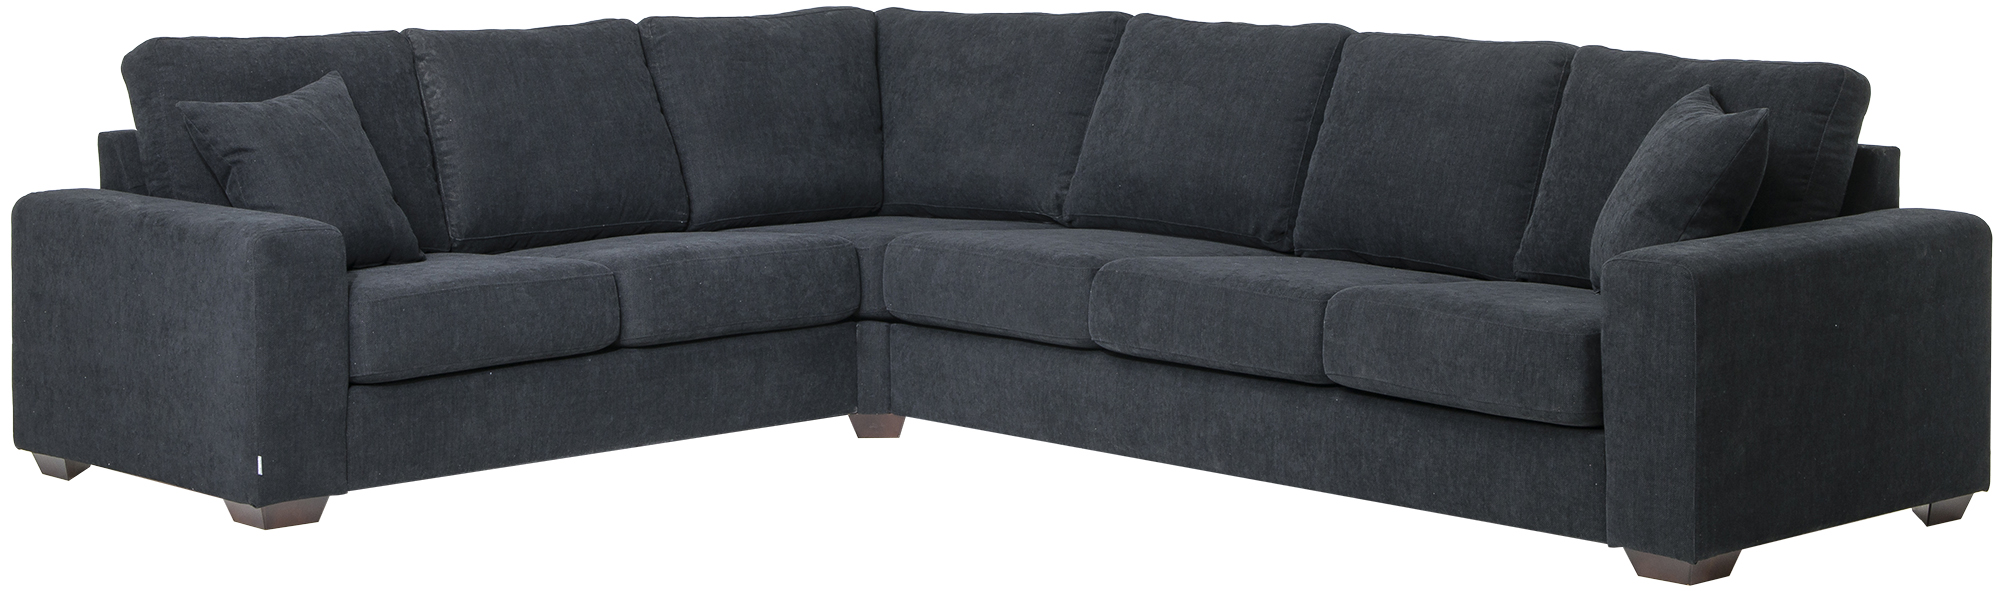 Casino winston sohva